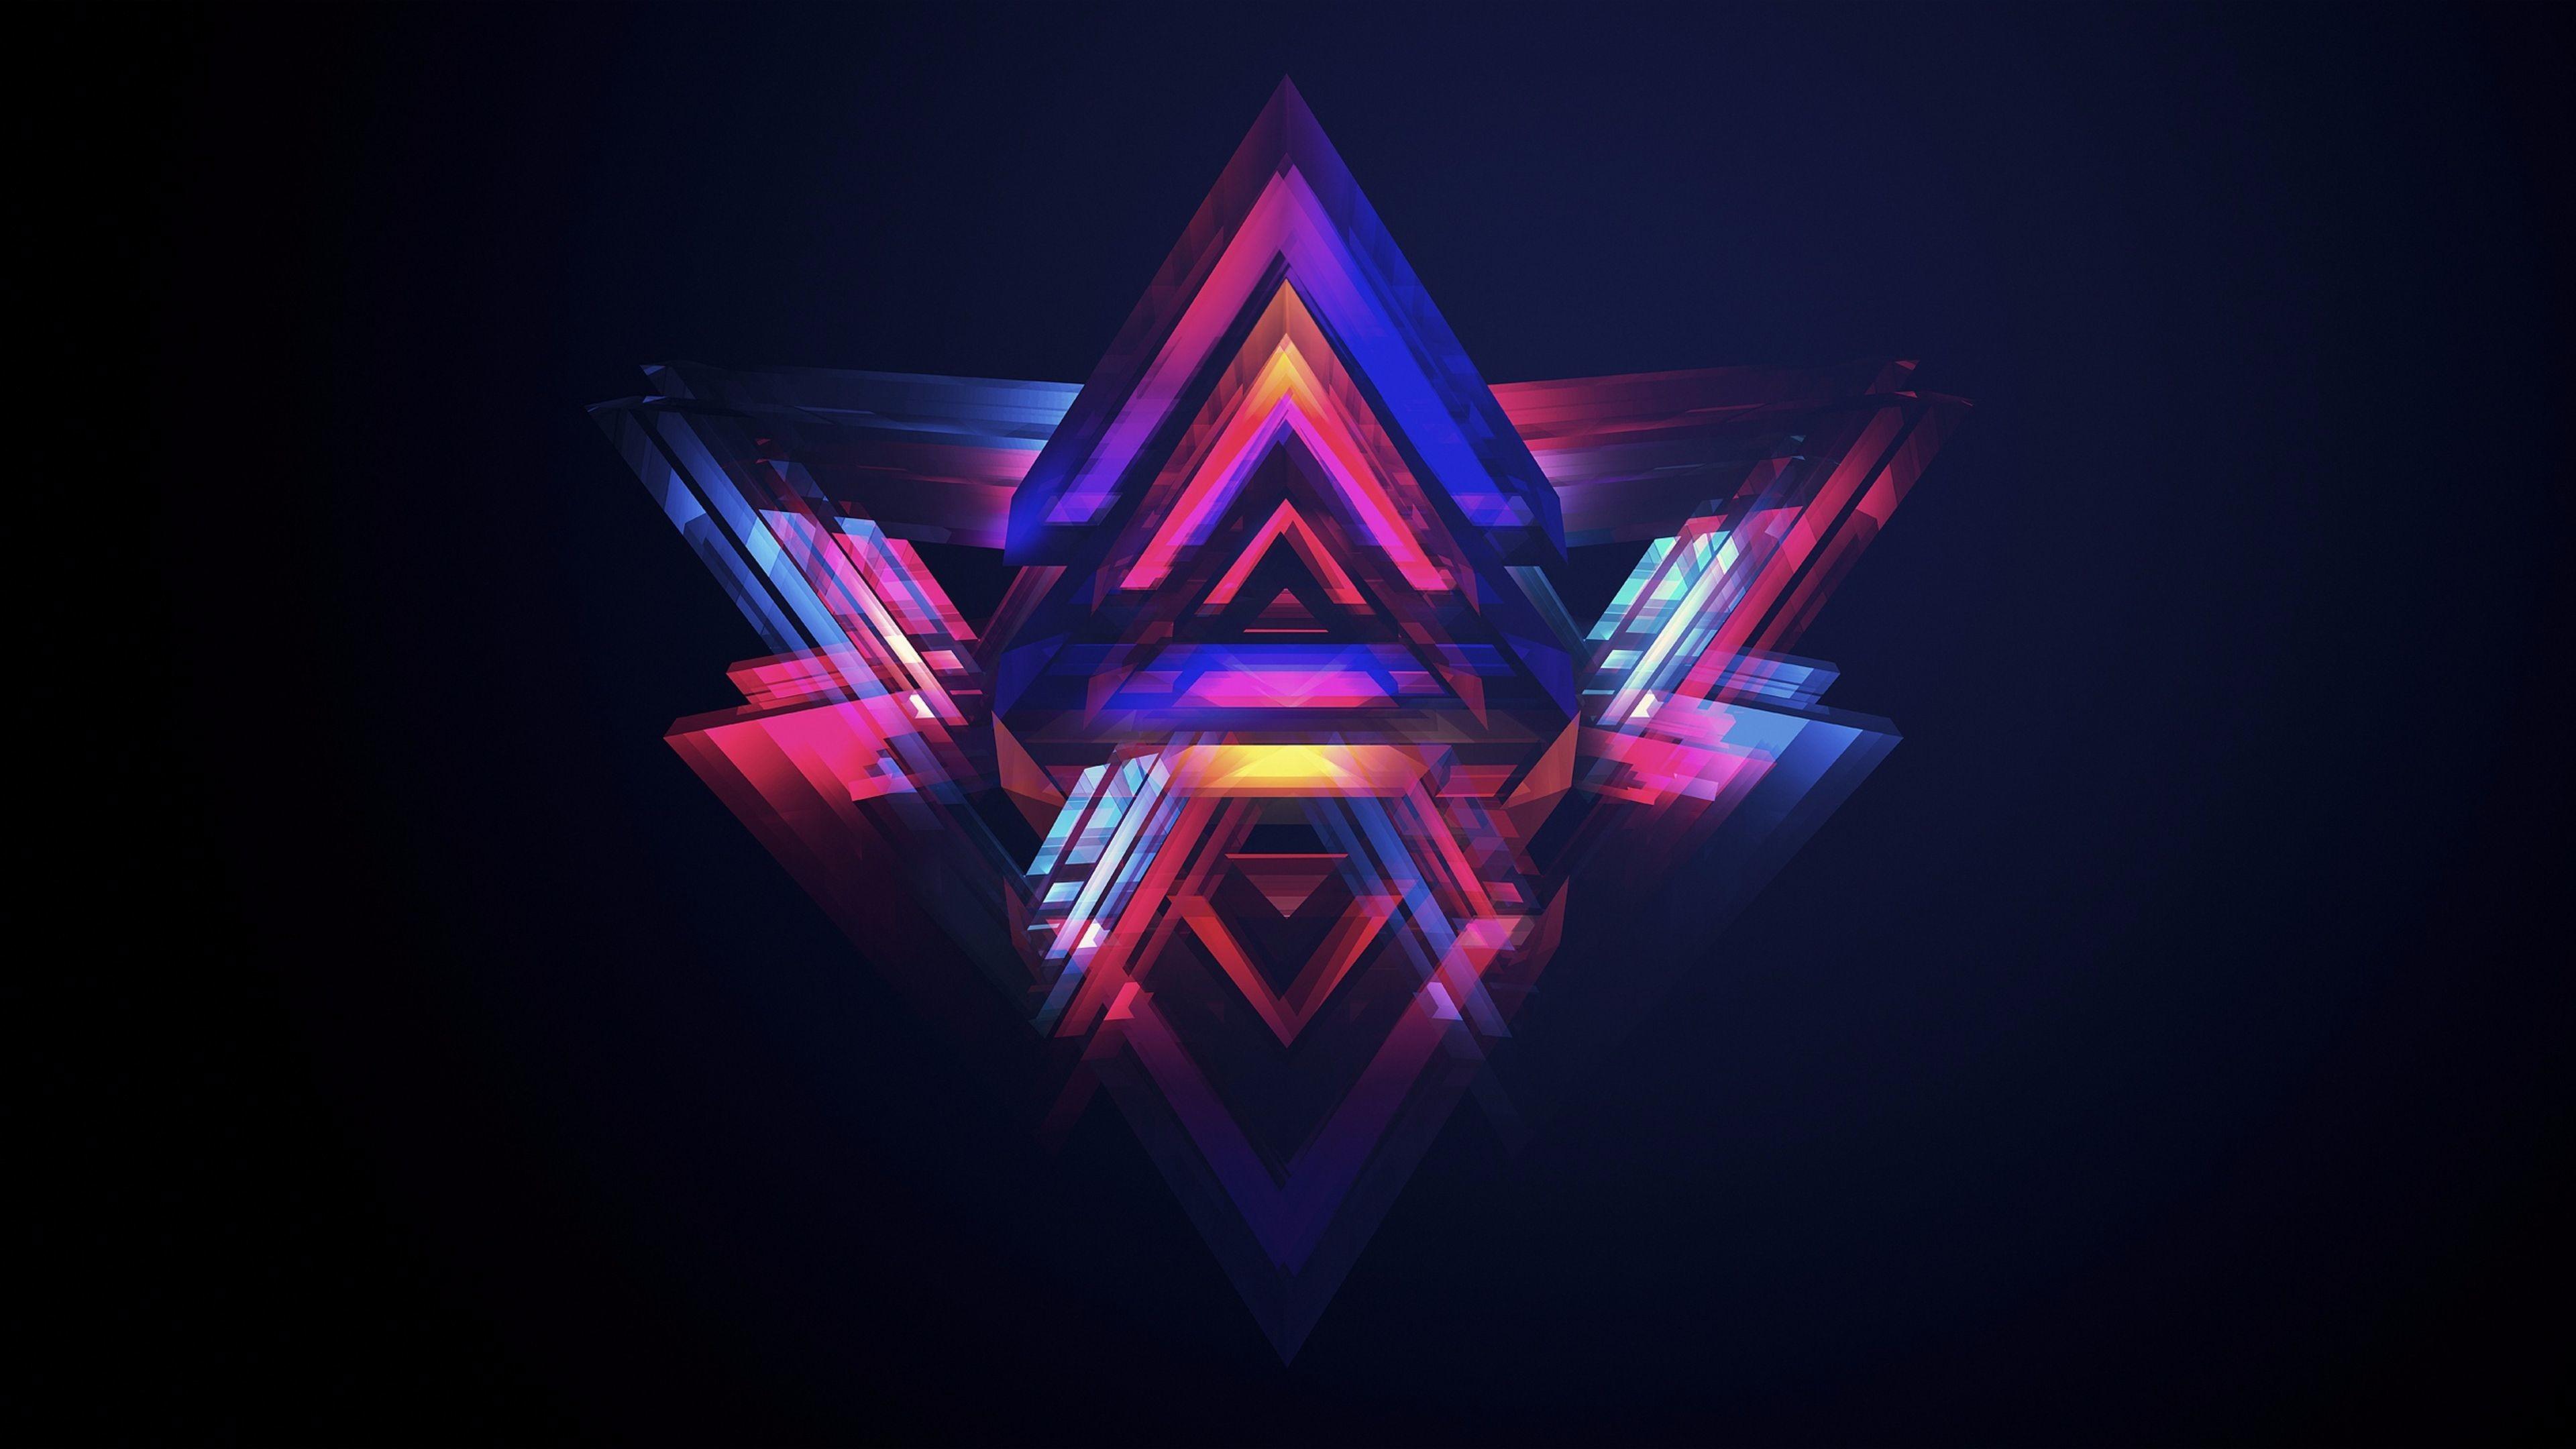 Colorful-Pyramid-Abstract-4K-Wallpaper.jpg (3840×2160)   Epic Wallpapers    Pinterest   Wallpaper and Artwork